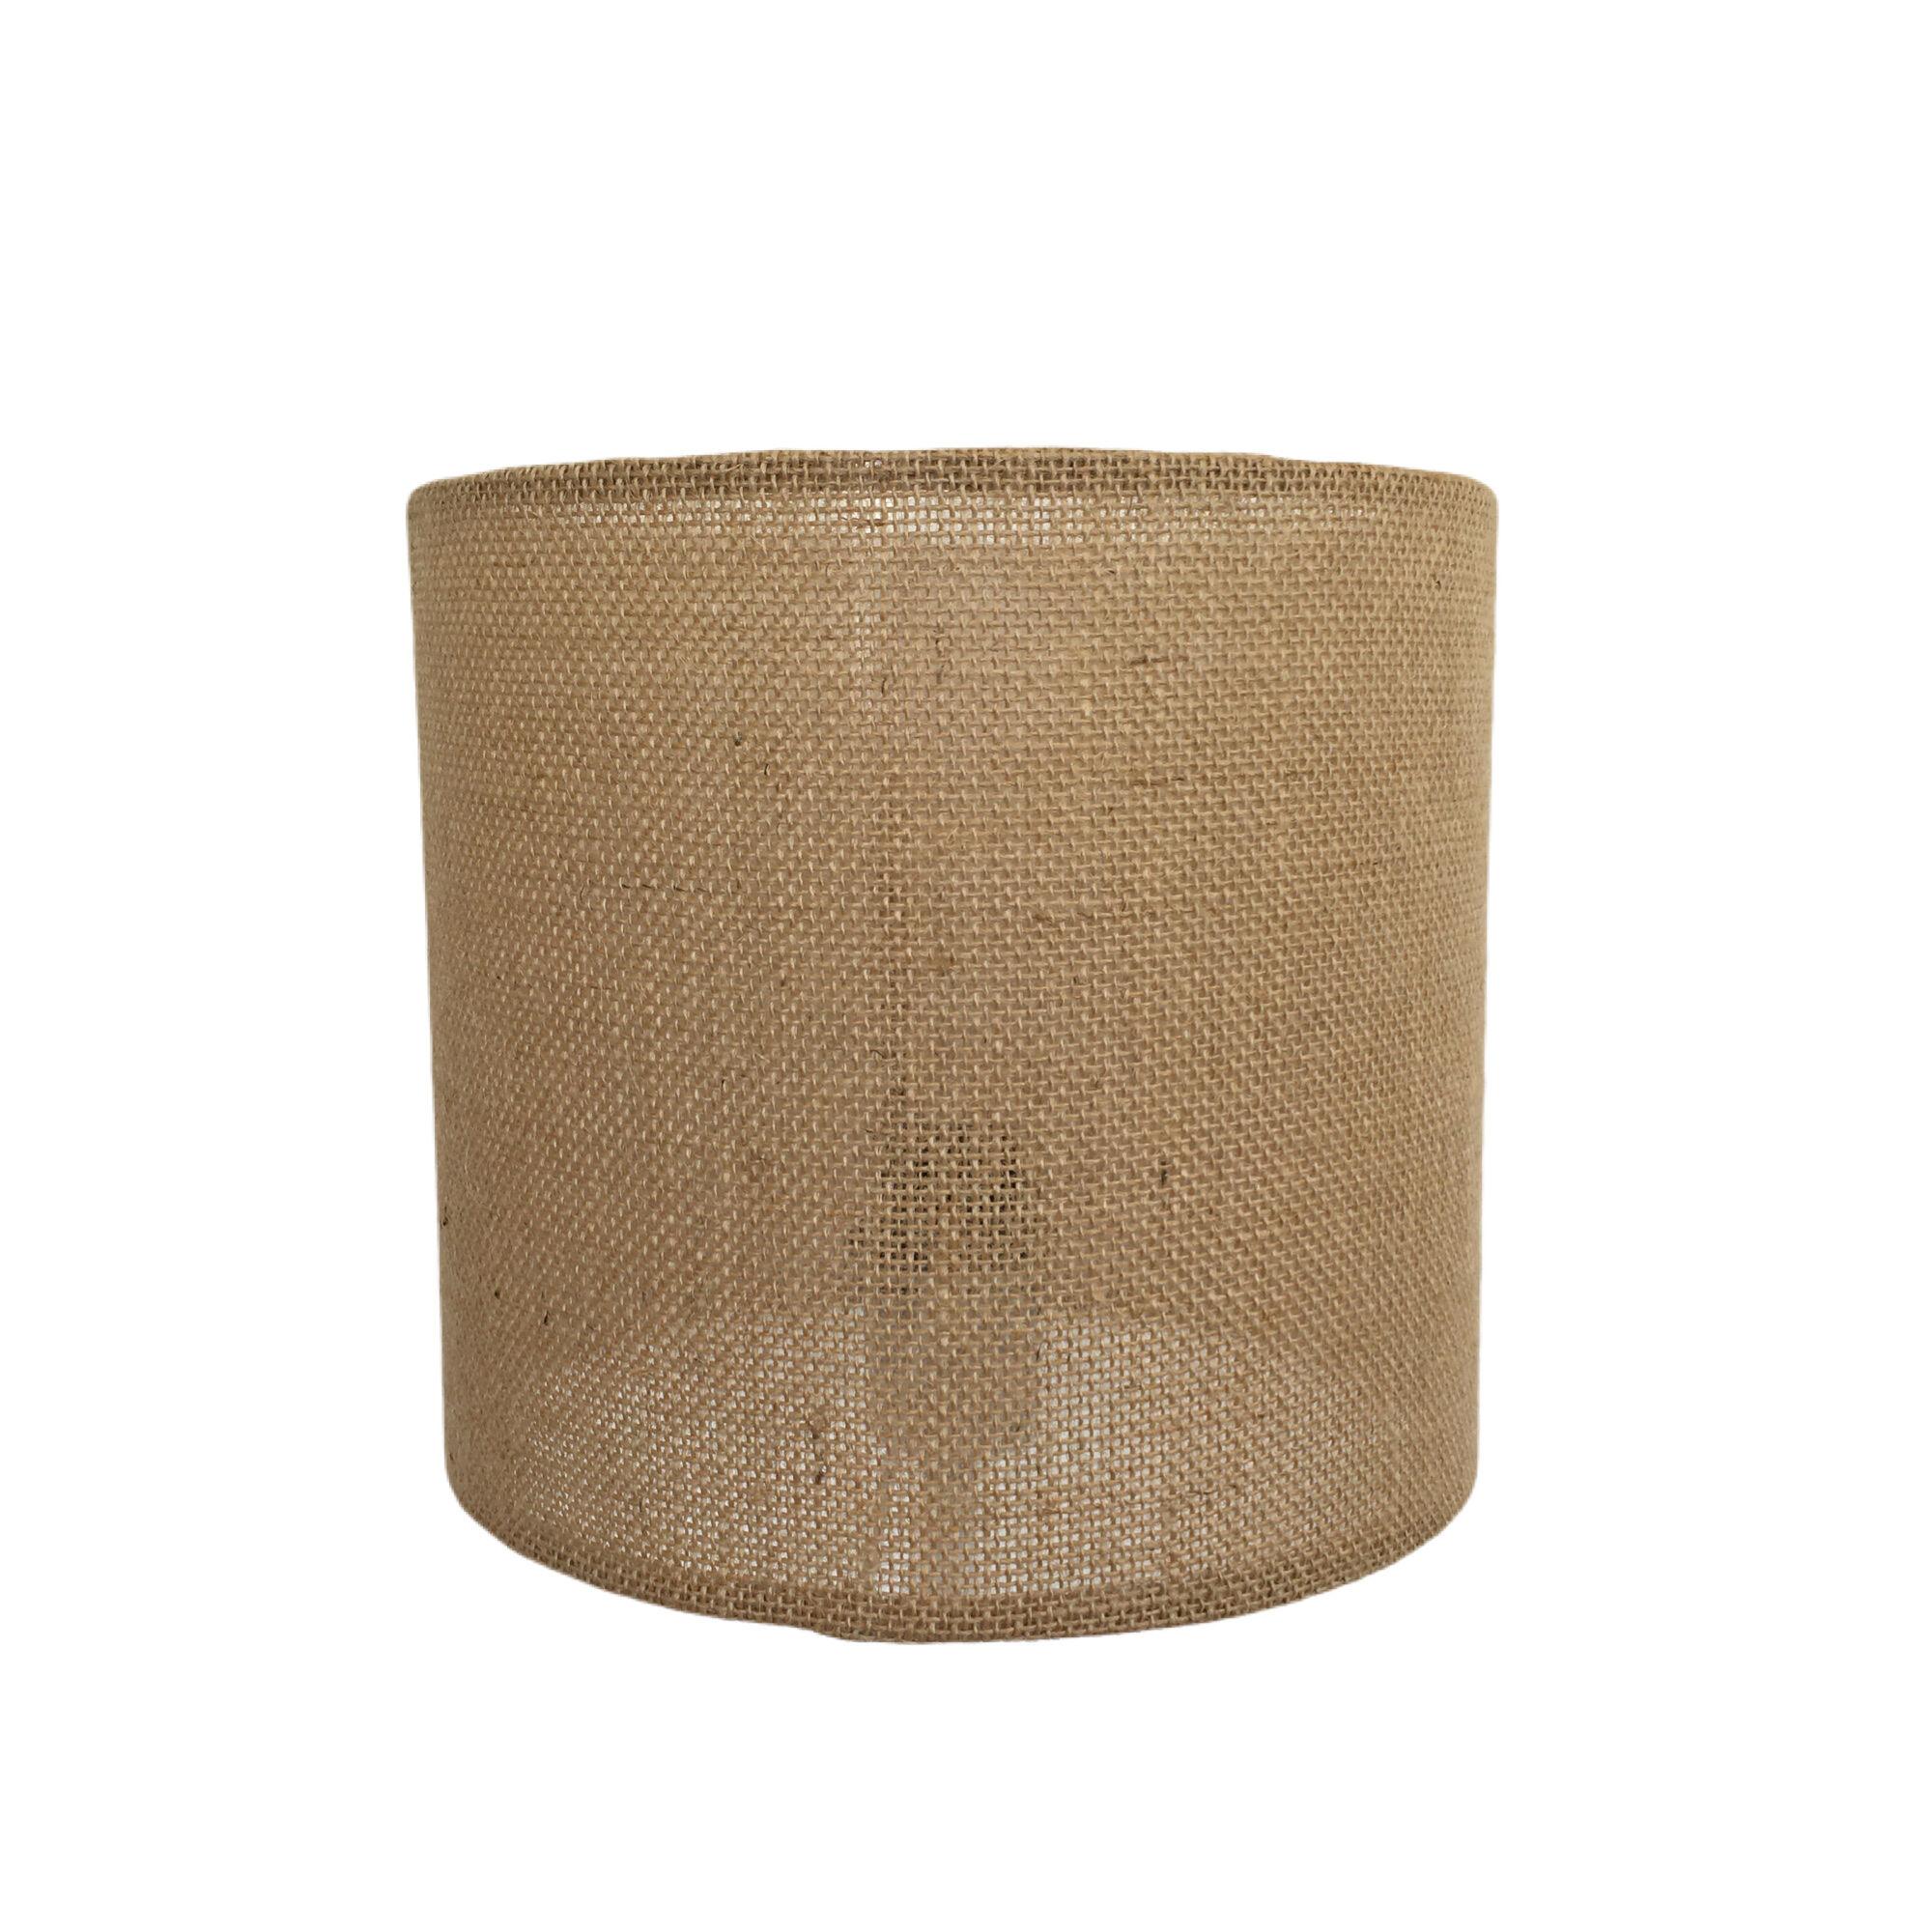 Belamp Suspension toile de jute diamètre 30 cm